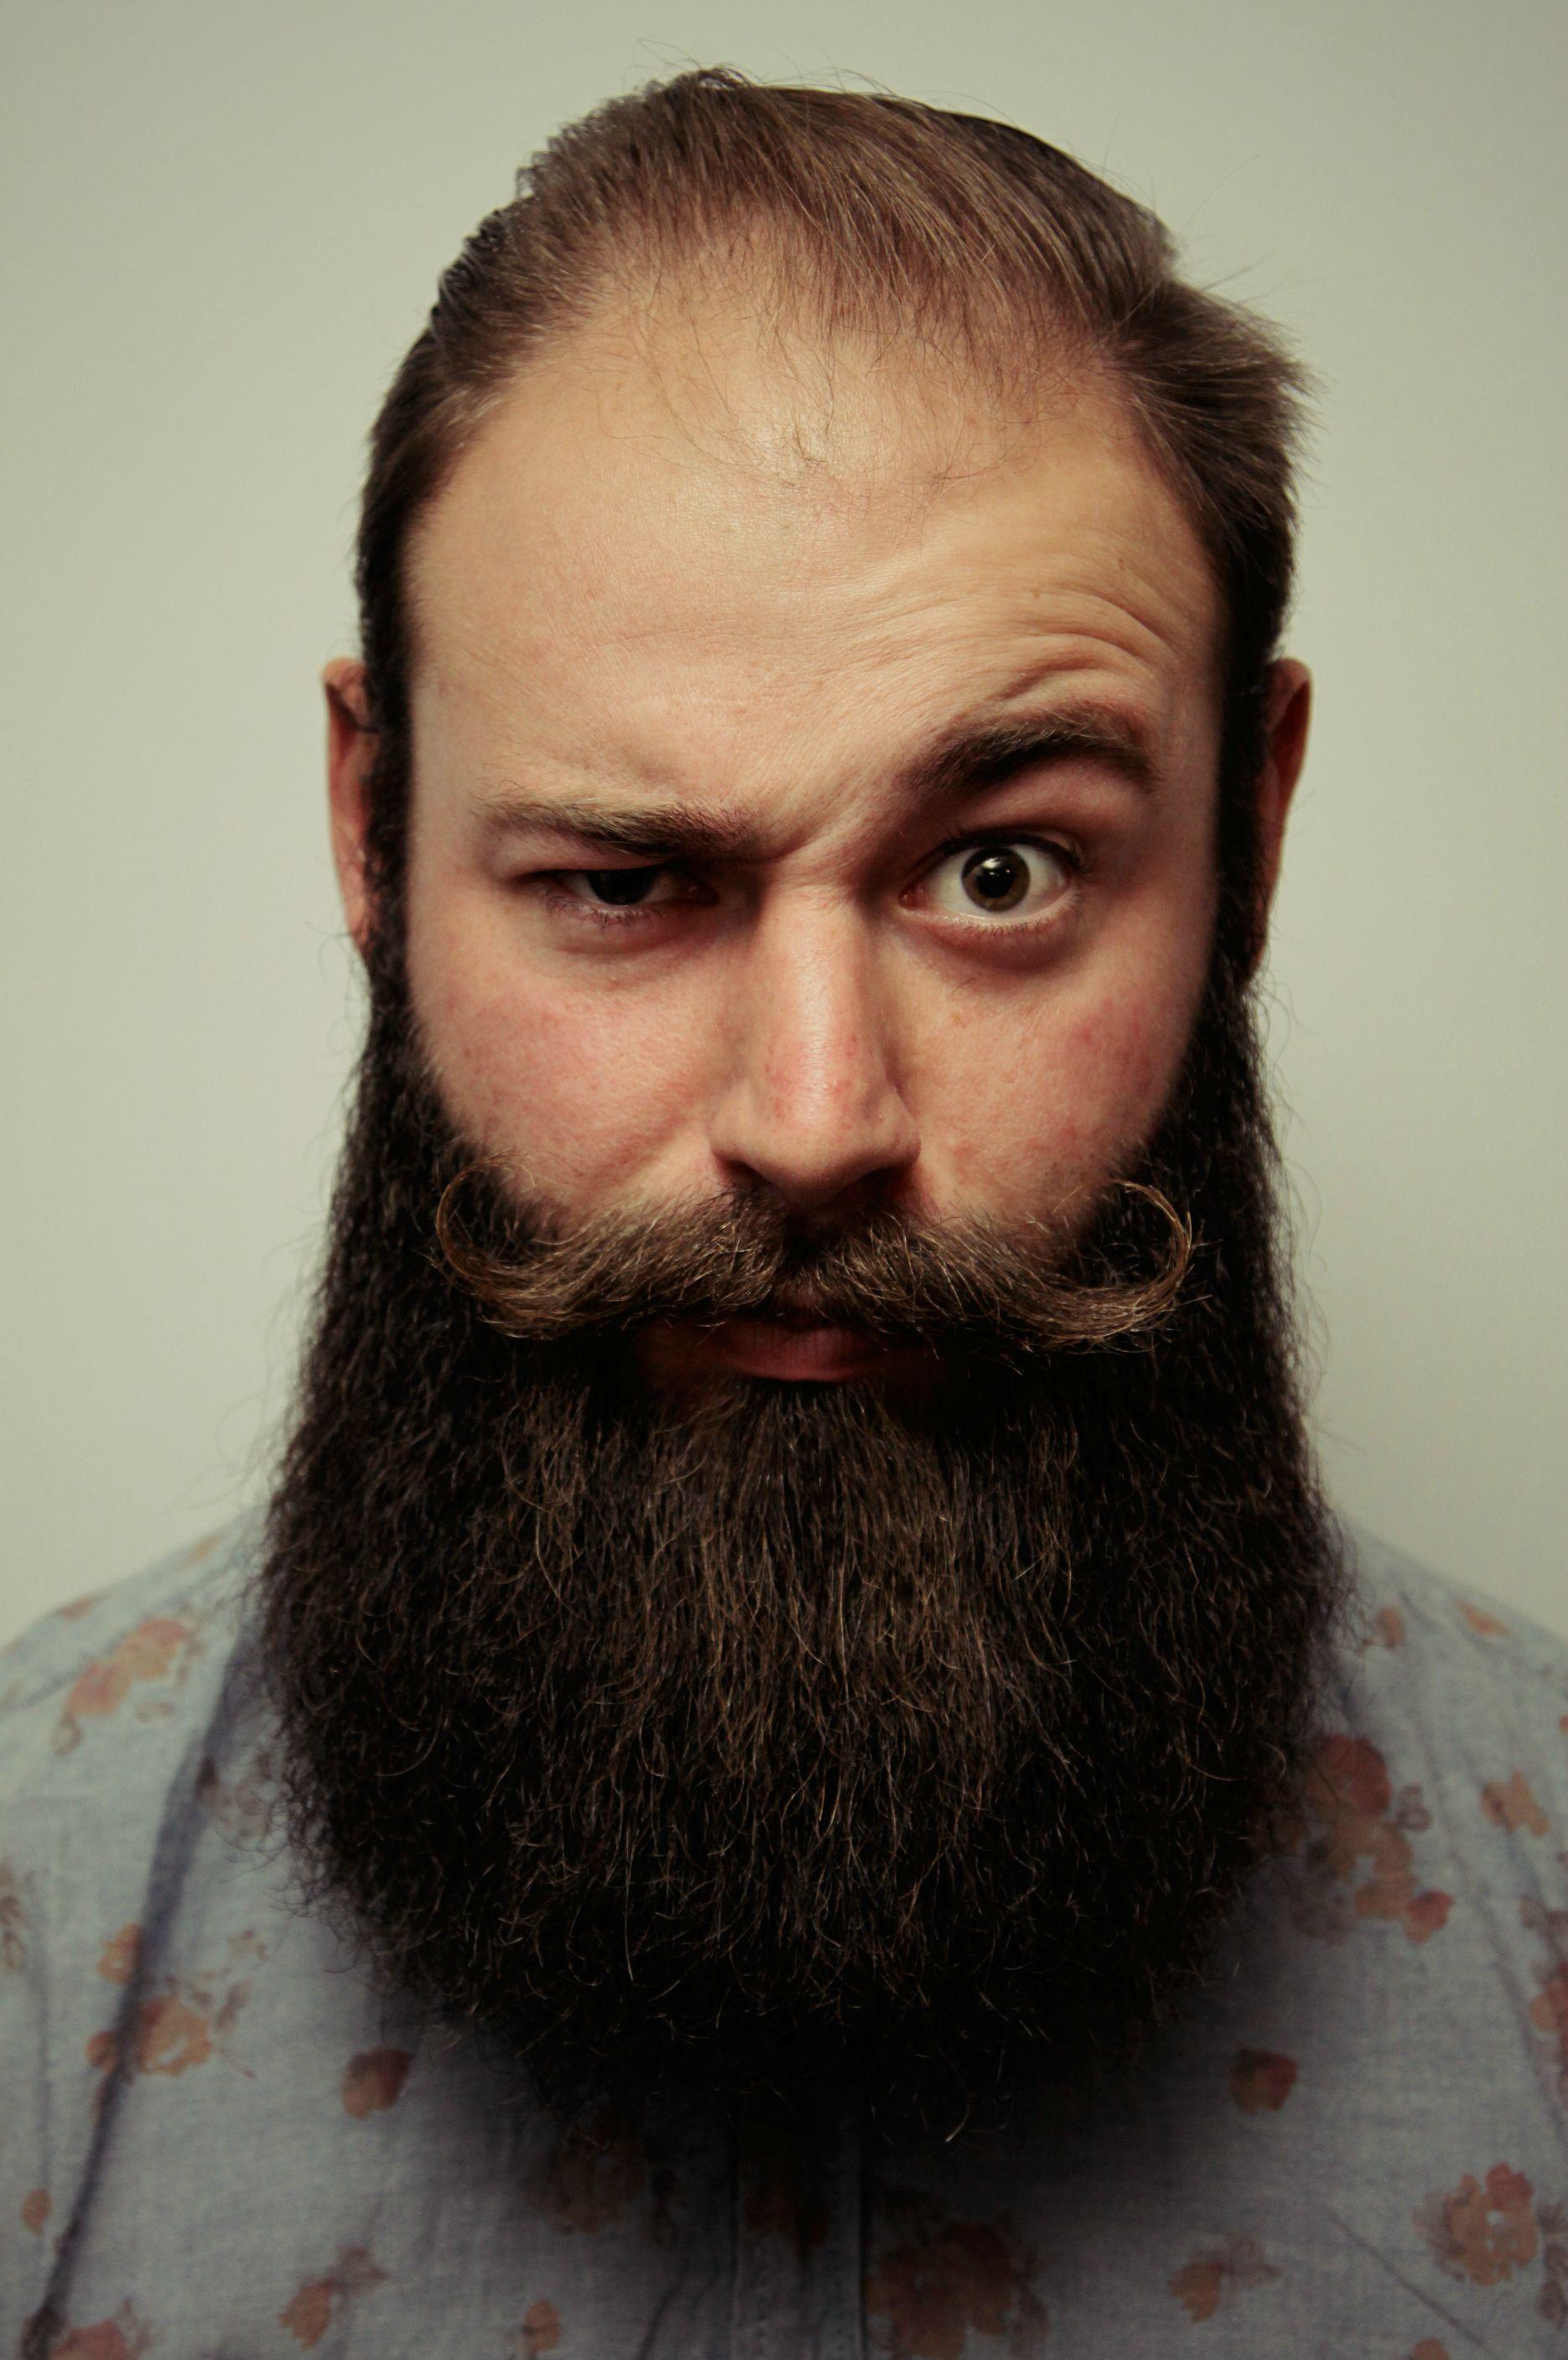 Ben noto Beard Grooming Tips : 7 Ways to Grow Your Beard Easily OJ84